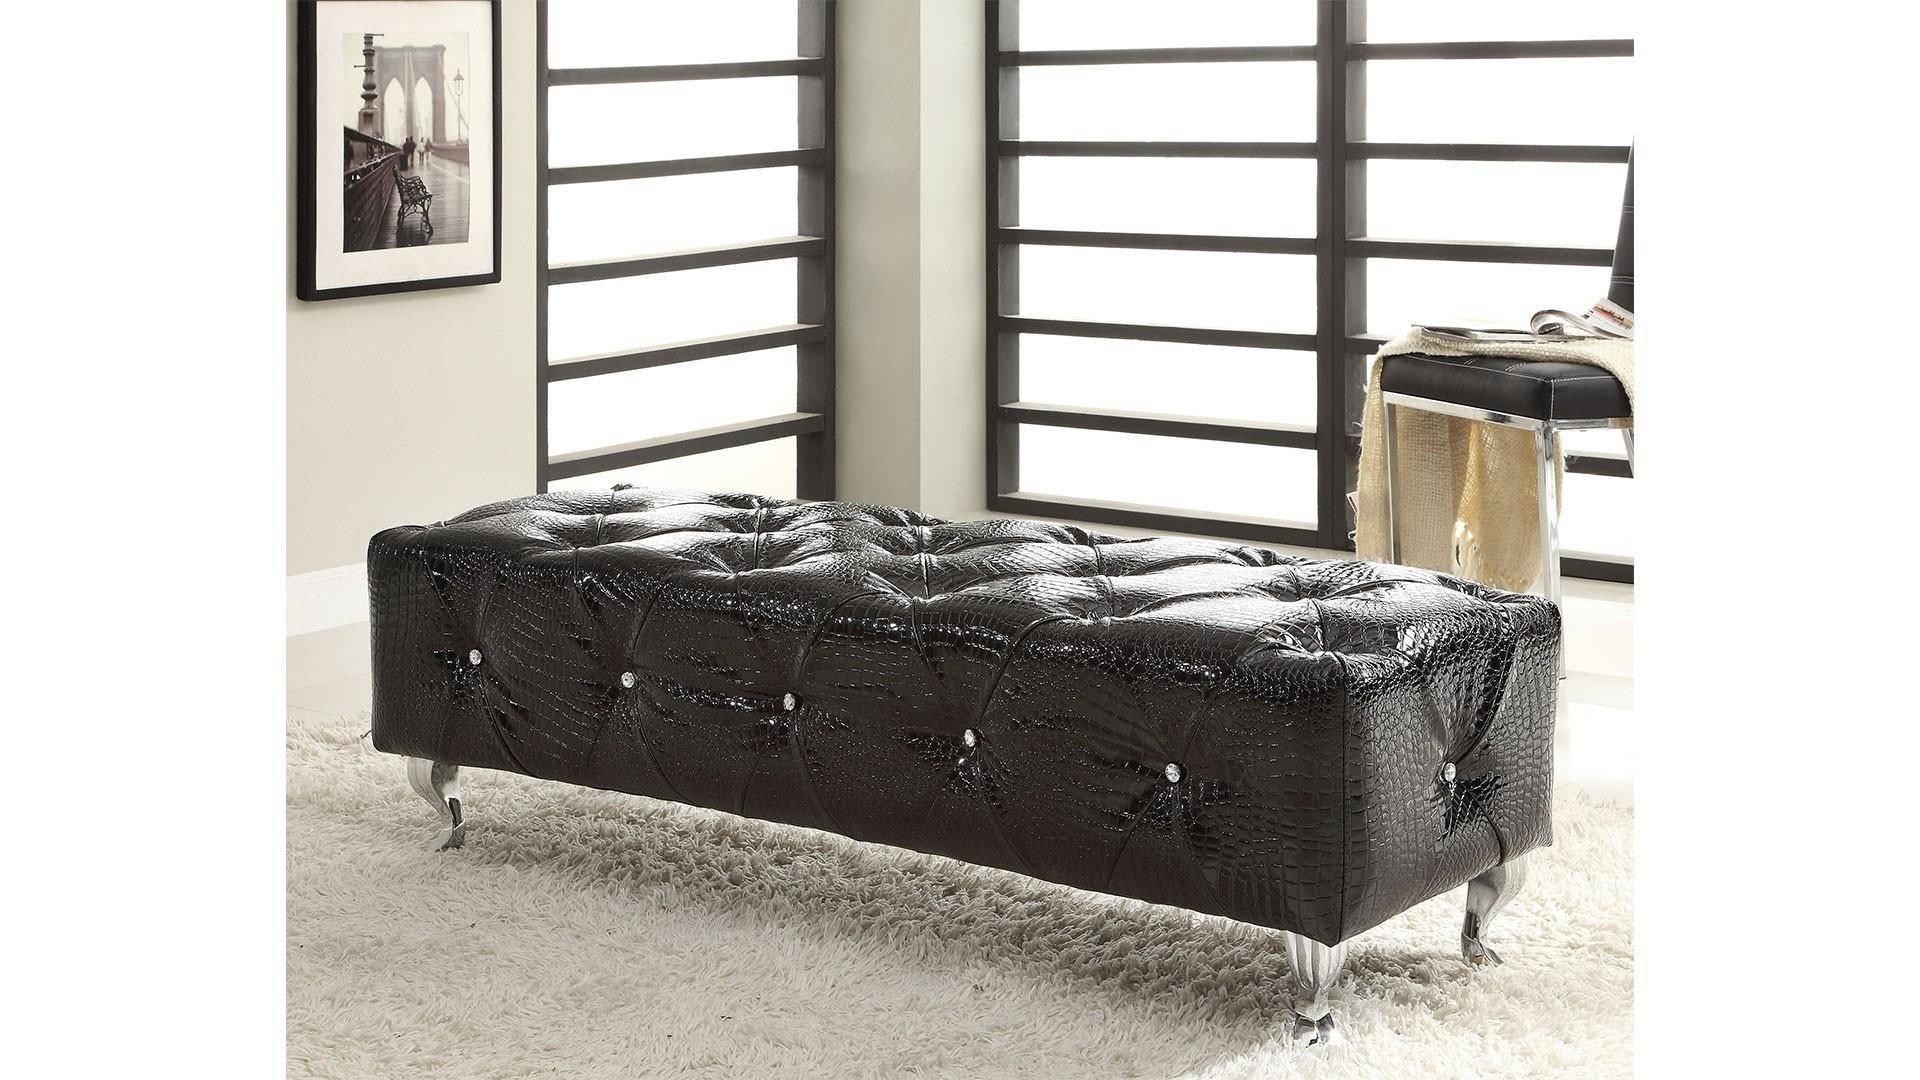 Queen Platform Bedroom Set Elegant at Home Michelle King Platform Bedroom Set 2 Pcs In Black Leather